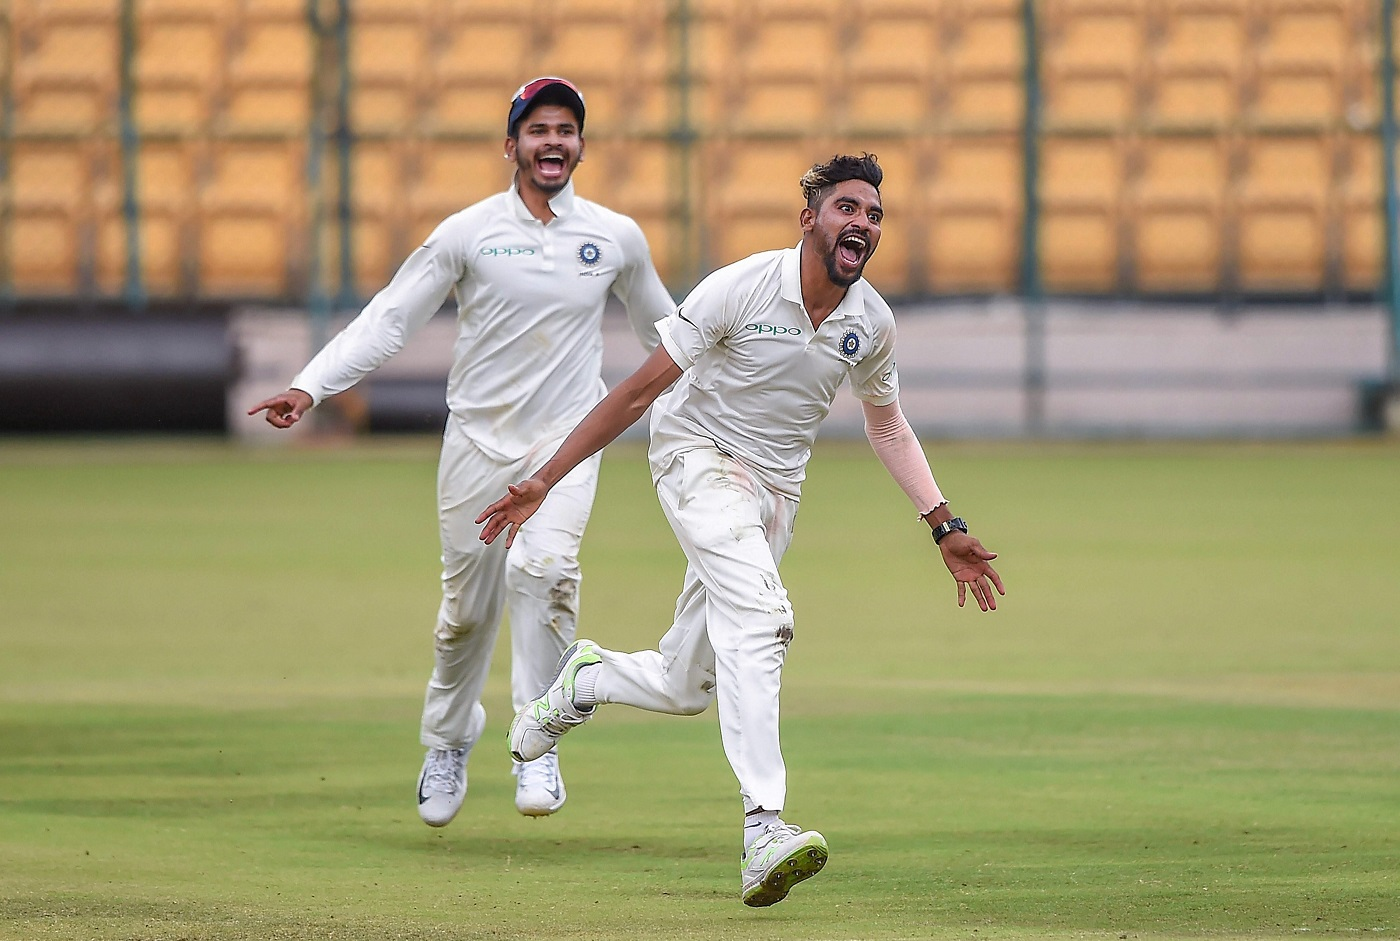 India vs West Indies 2018: Shikhar Dhawan Dropped, Mohammed Siraj & Mayank Agarwal Receive Maiden Test Call 1